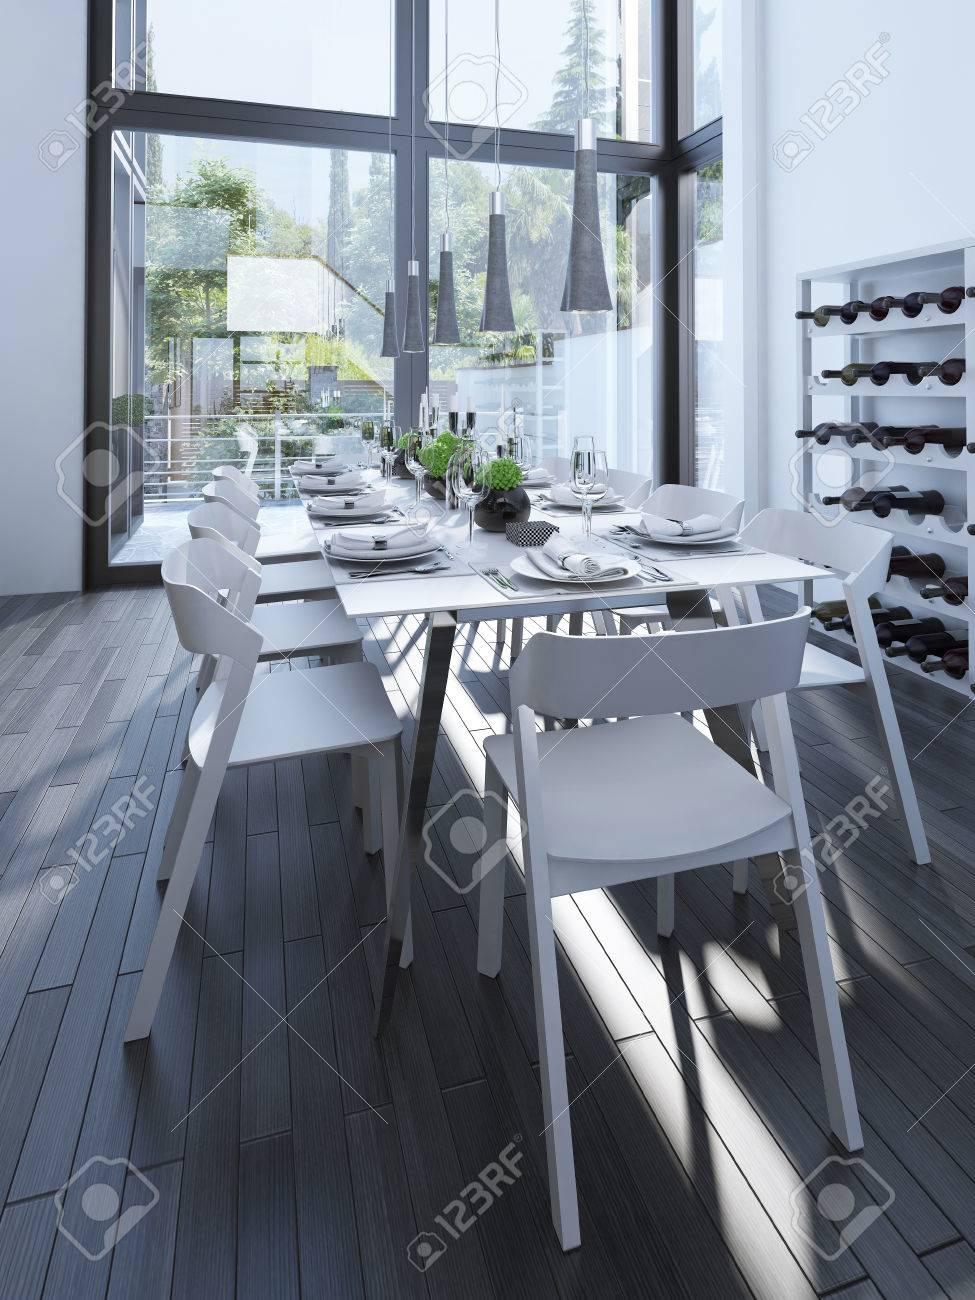 Diseño Moderno Comedor Con Botellero. Vector Servido Con Muebles ...